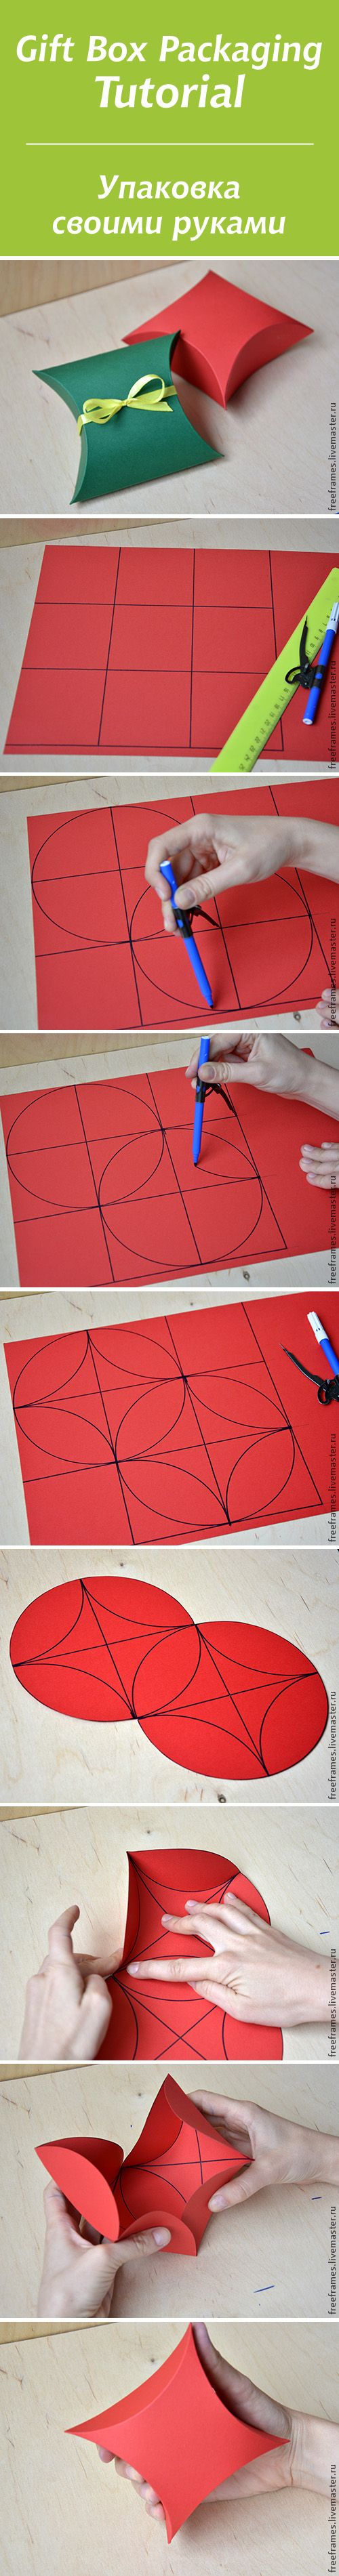 Упаковка своими руками / Gift Box Packaging Tutorial #pack #packaging